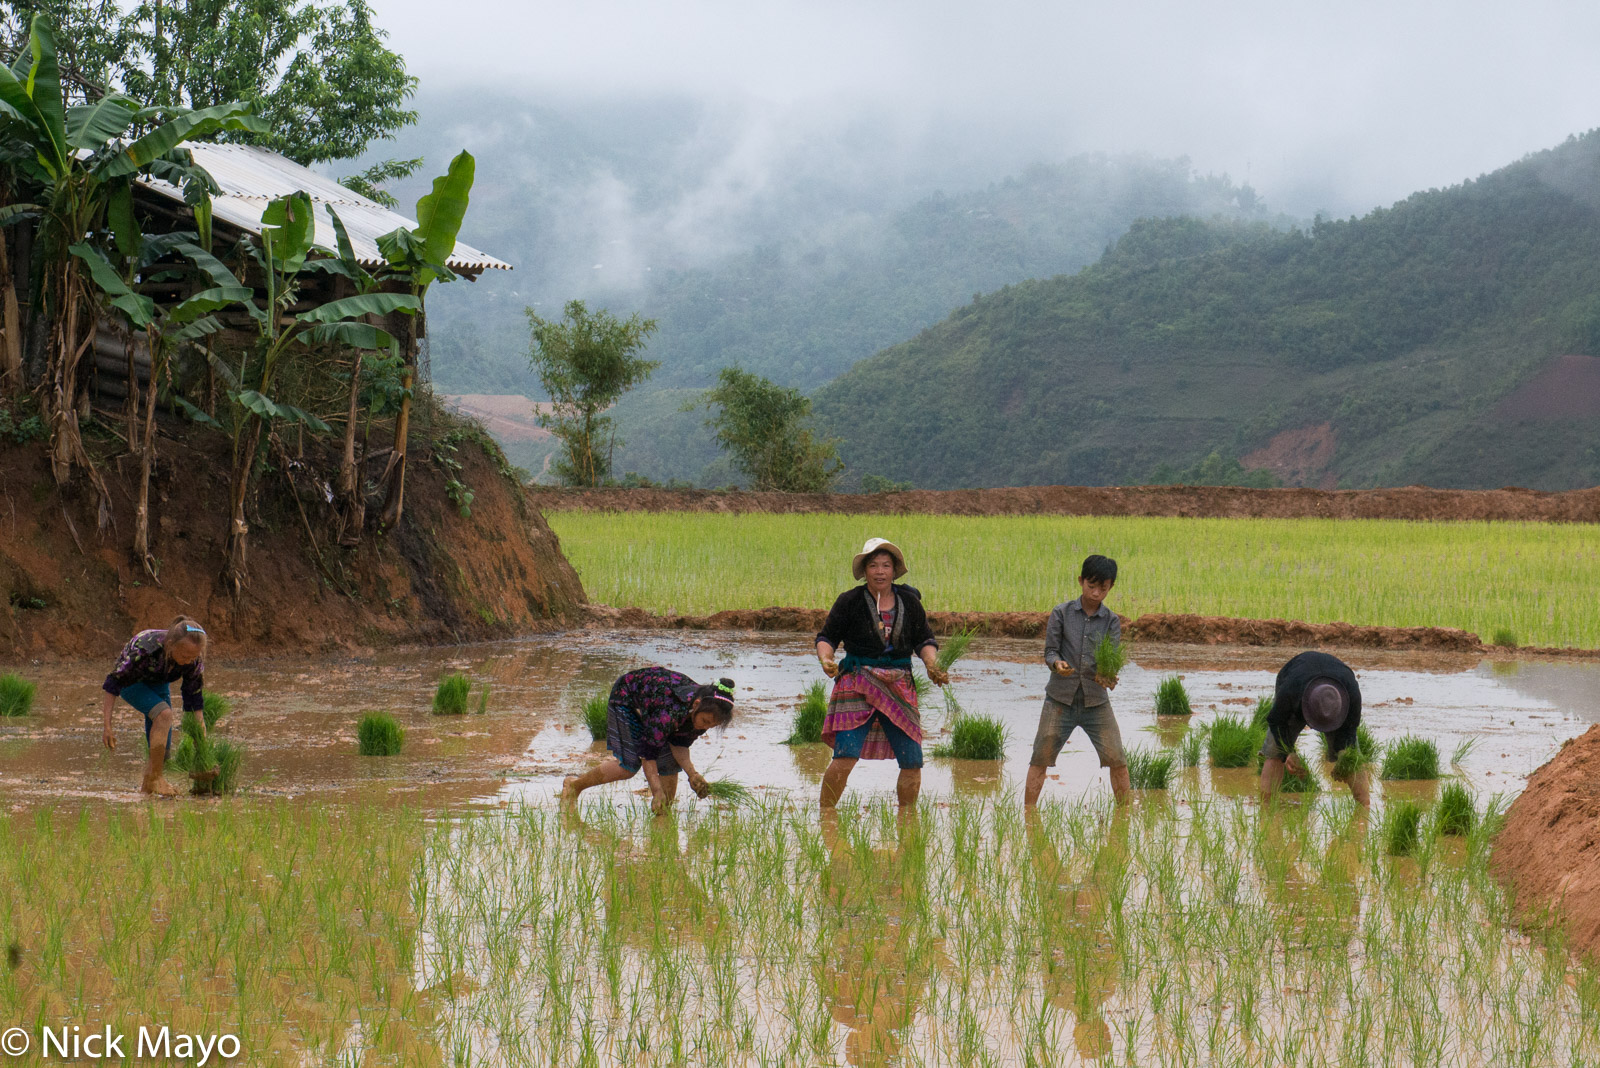 Dien Bien, Miao, Paddy, Transplanting, Vietnam, photo